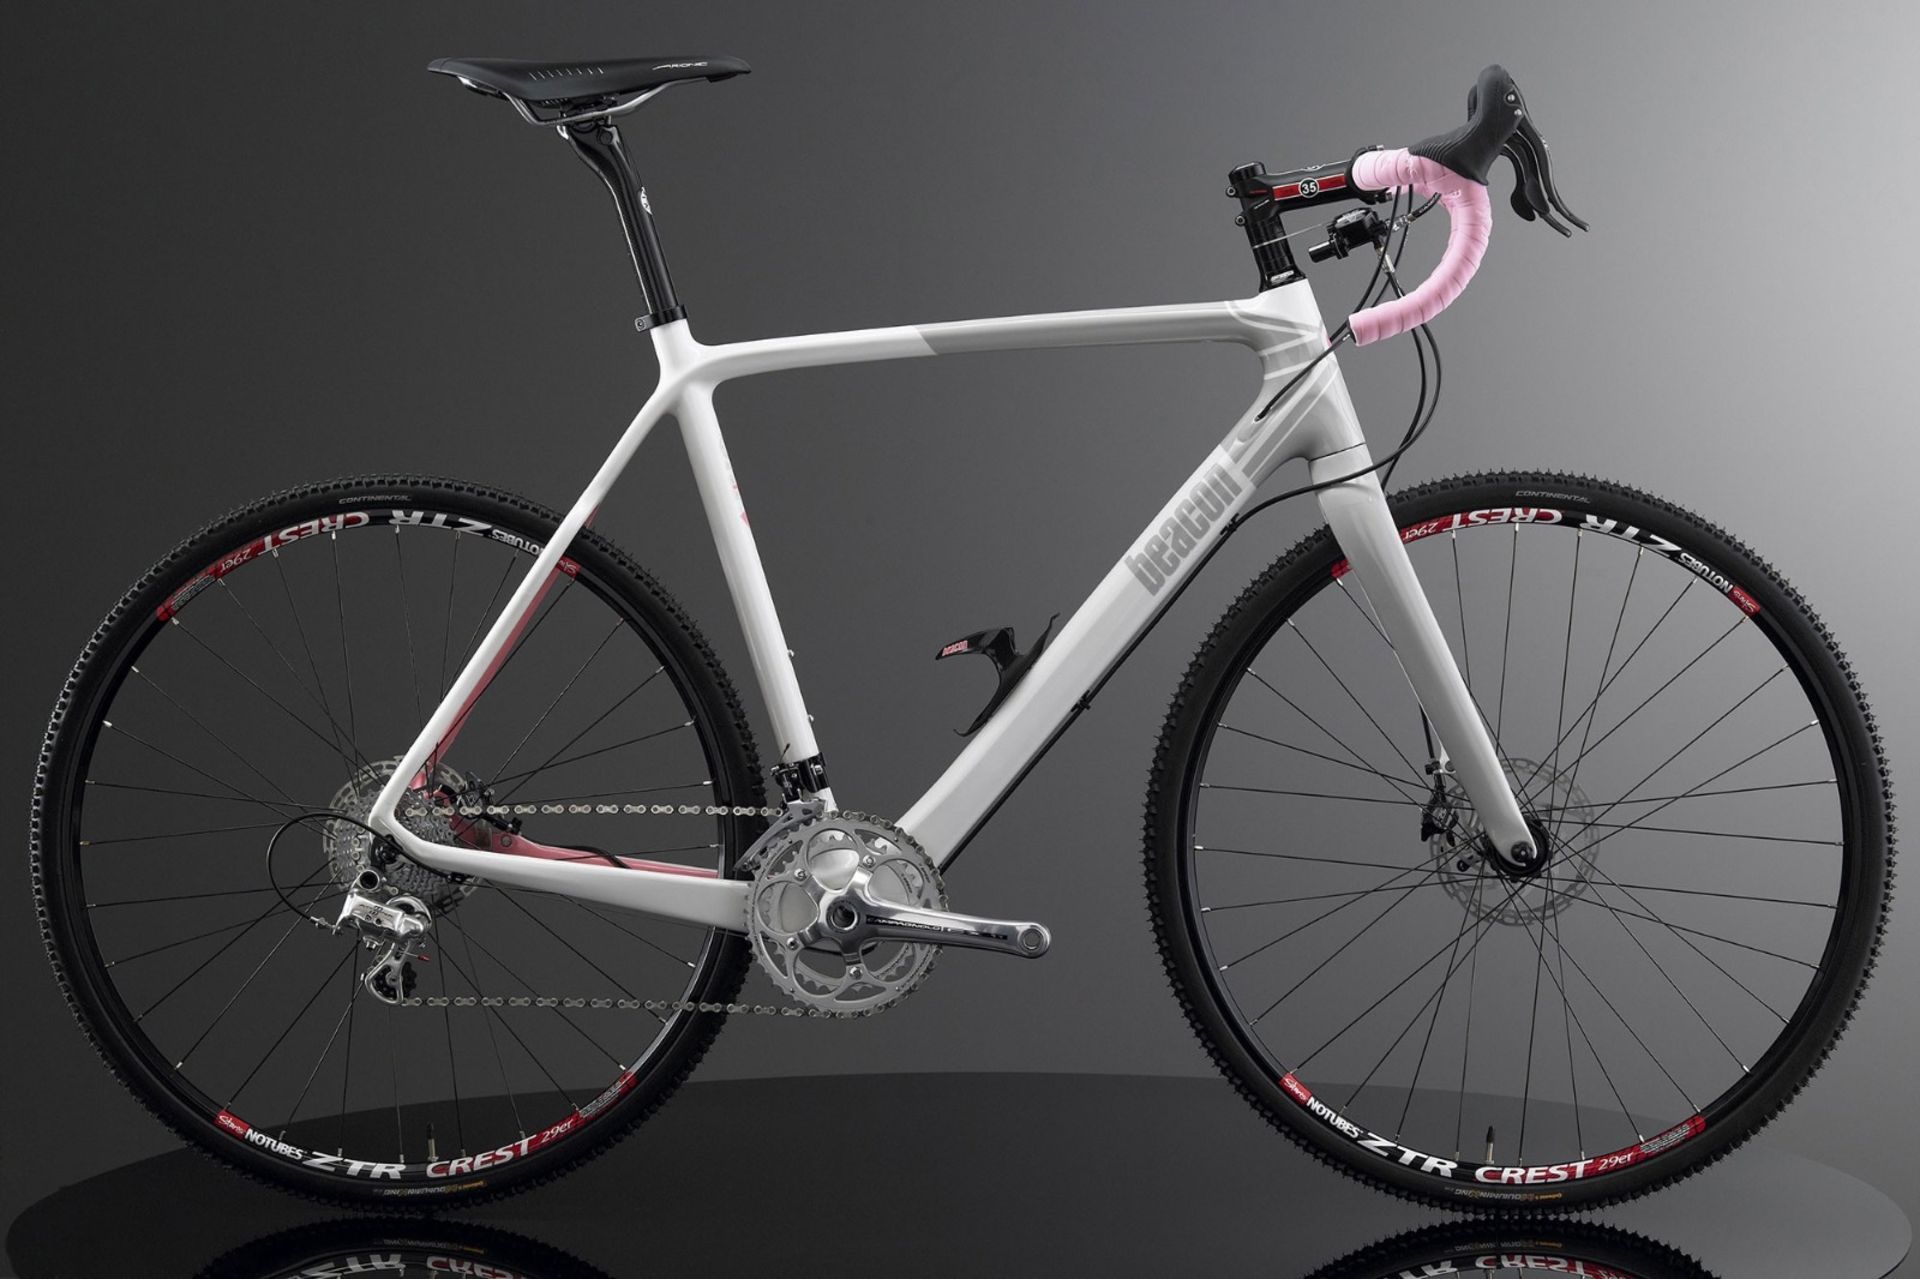 Lot 53 - 1 x Beacon Model BF-45, Size 540, Carbon Fibre Bike Frame in White & Grey.